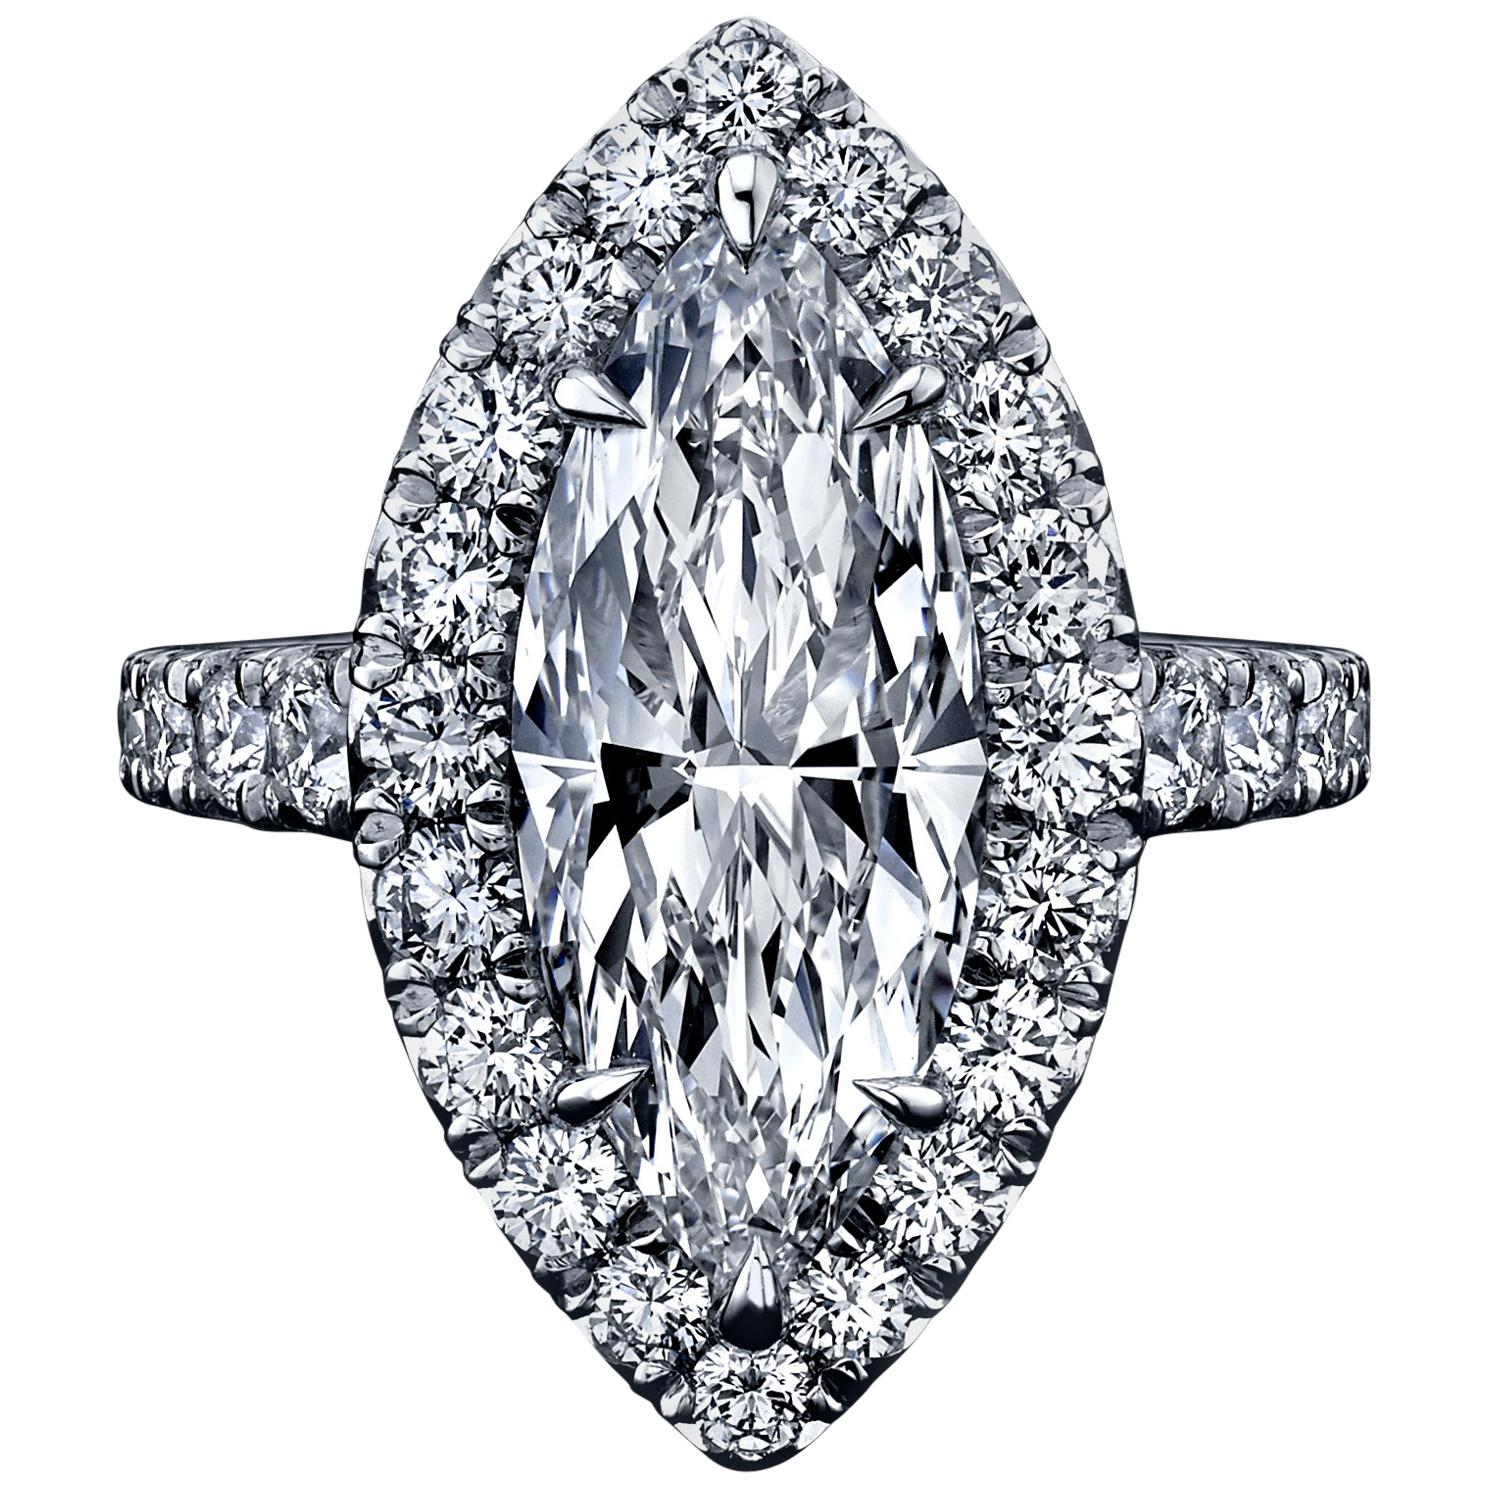 FIA Certified Elegant 3.80 Carat Marquise Diamond Ring